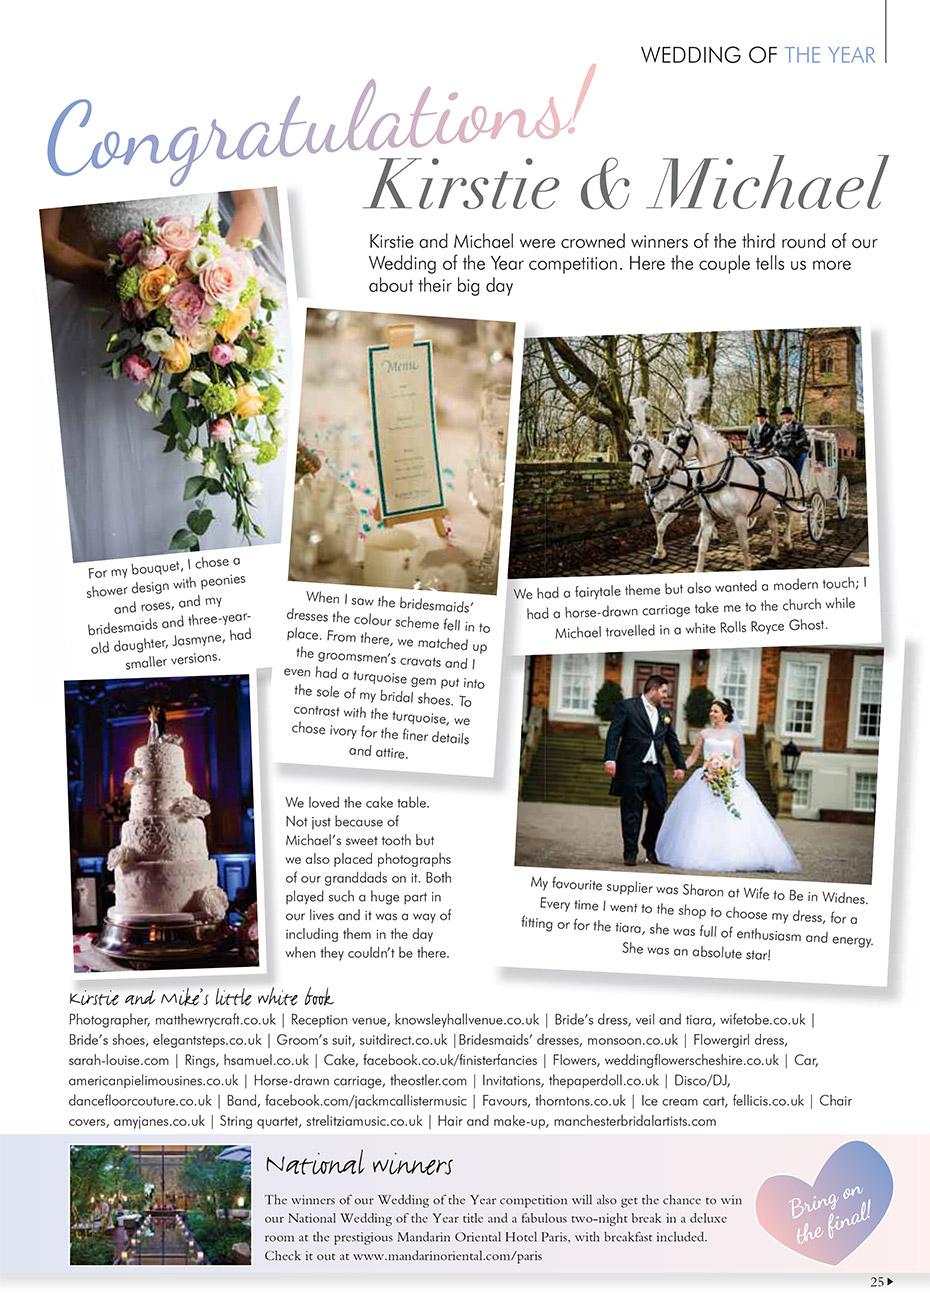 Your Cheshire and Merseyside Wedding Magazine - Wedding of the Year